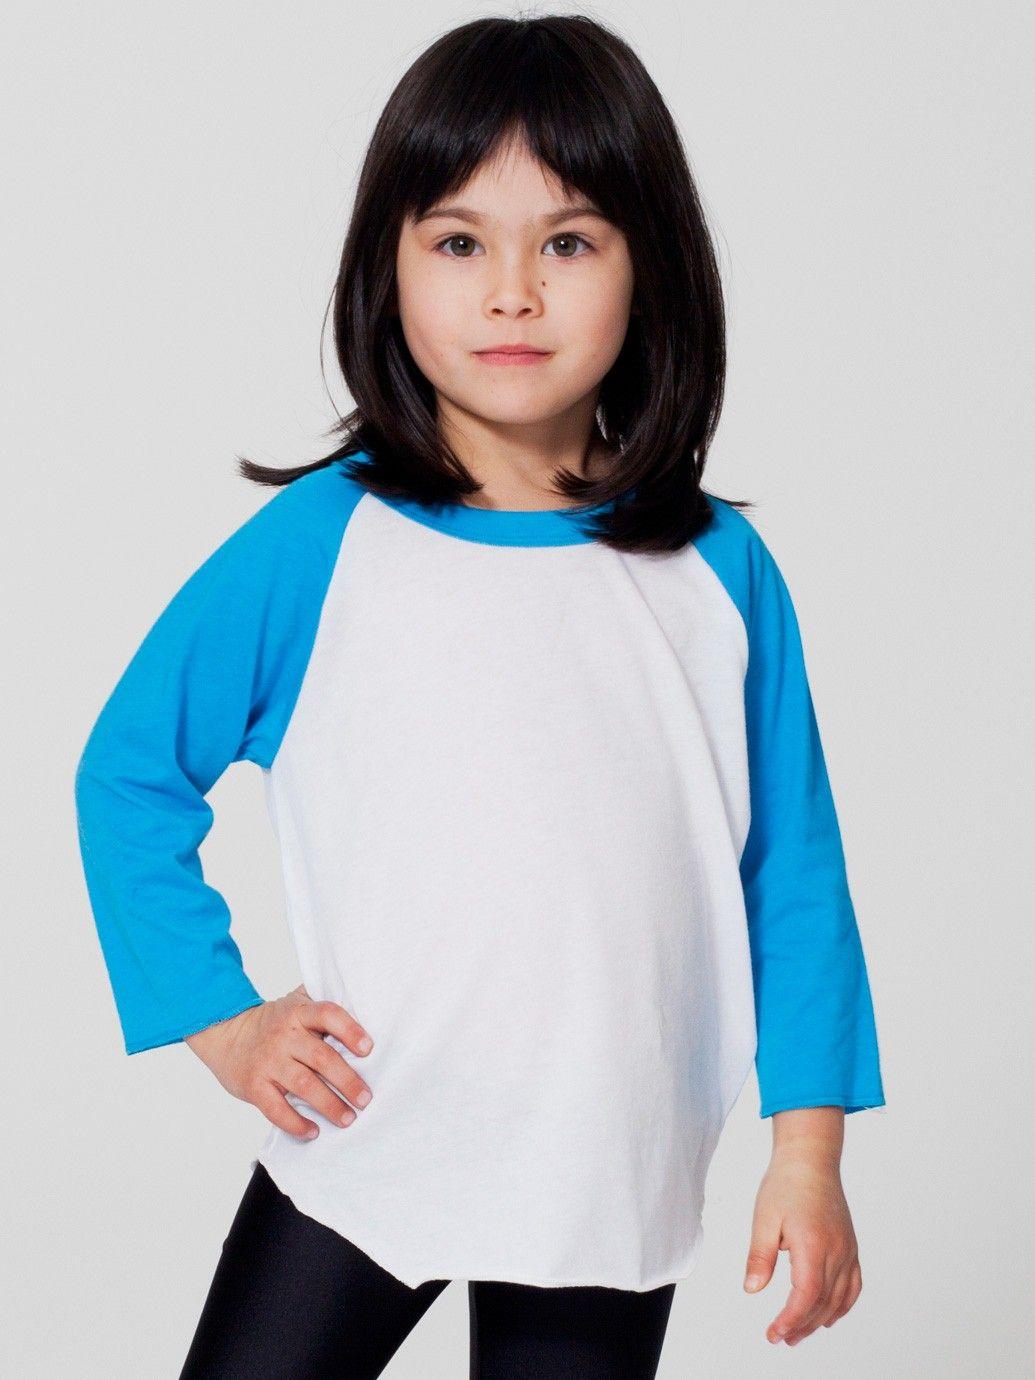 Kids Poly-Cotton 3/4 Sleeve Raglan | Shop American Apparel